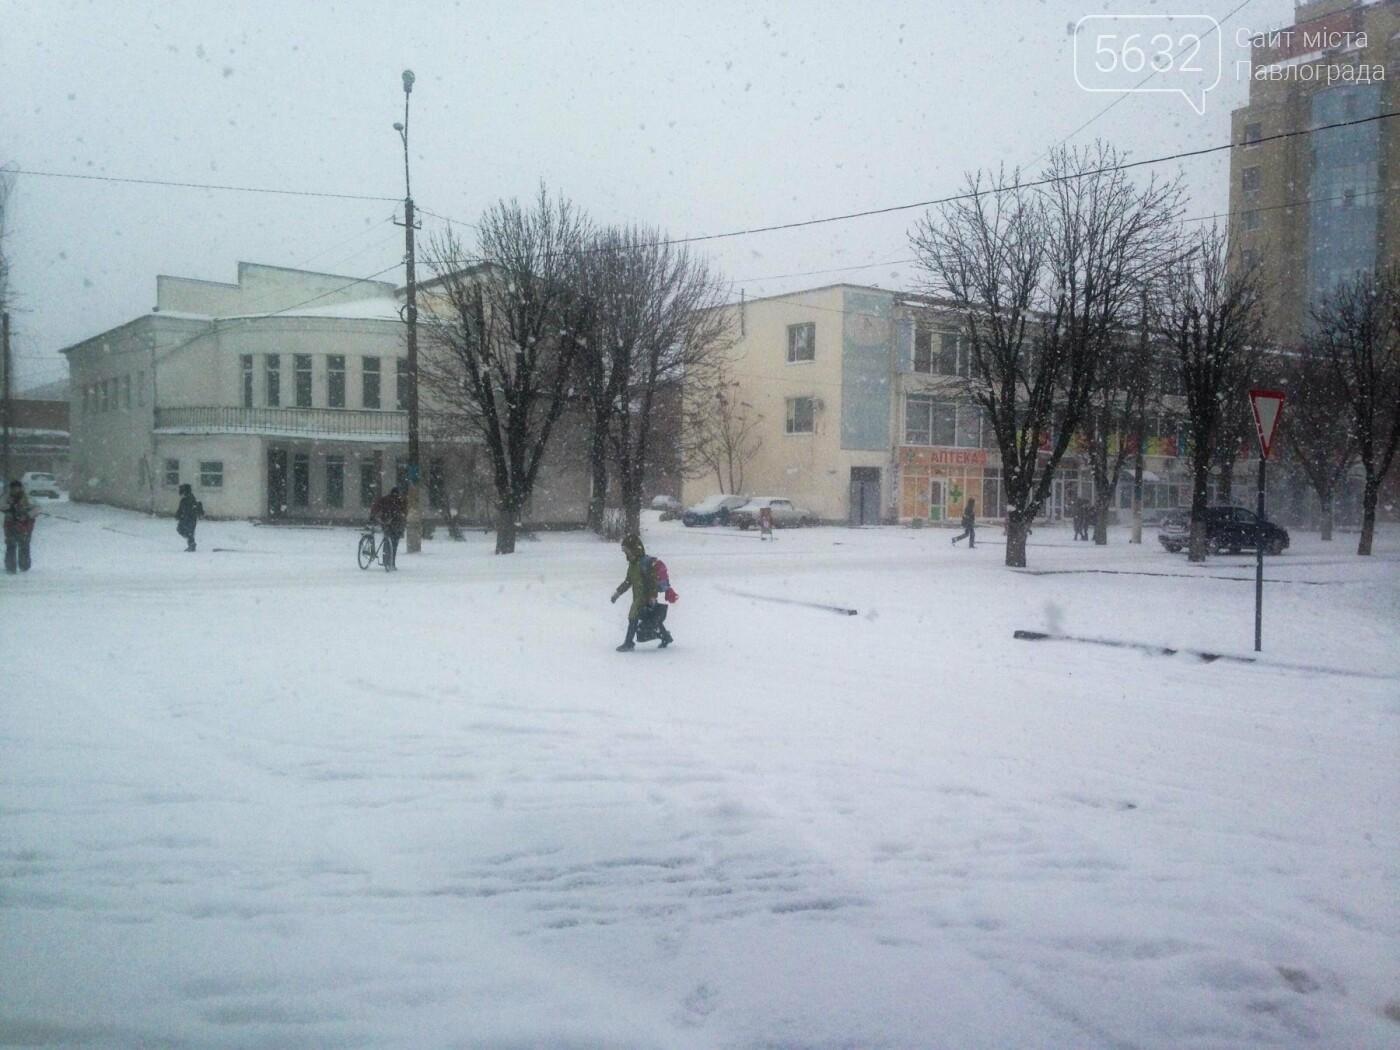 В Павлоград пришла зима: город накрыло снегом, фото-3